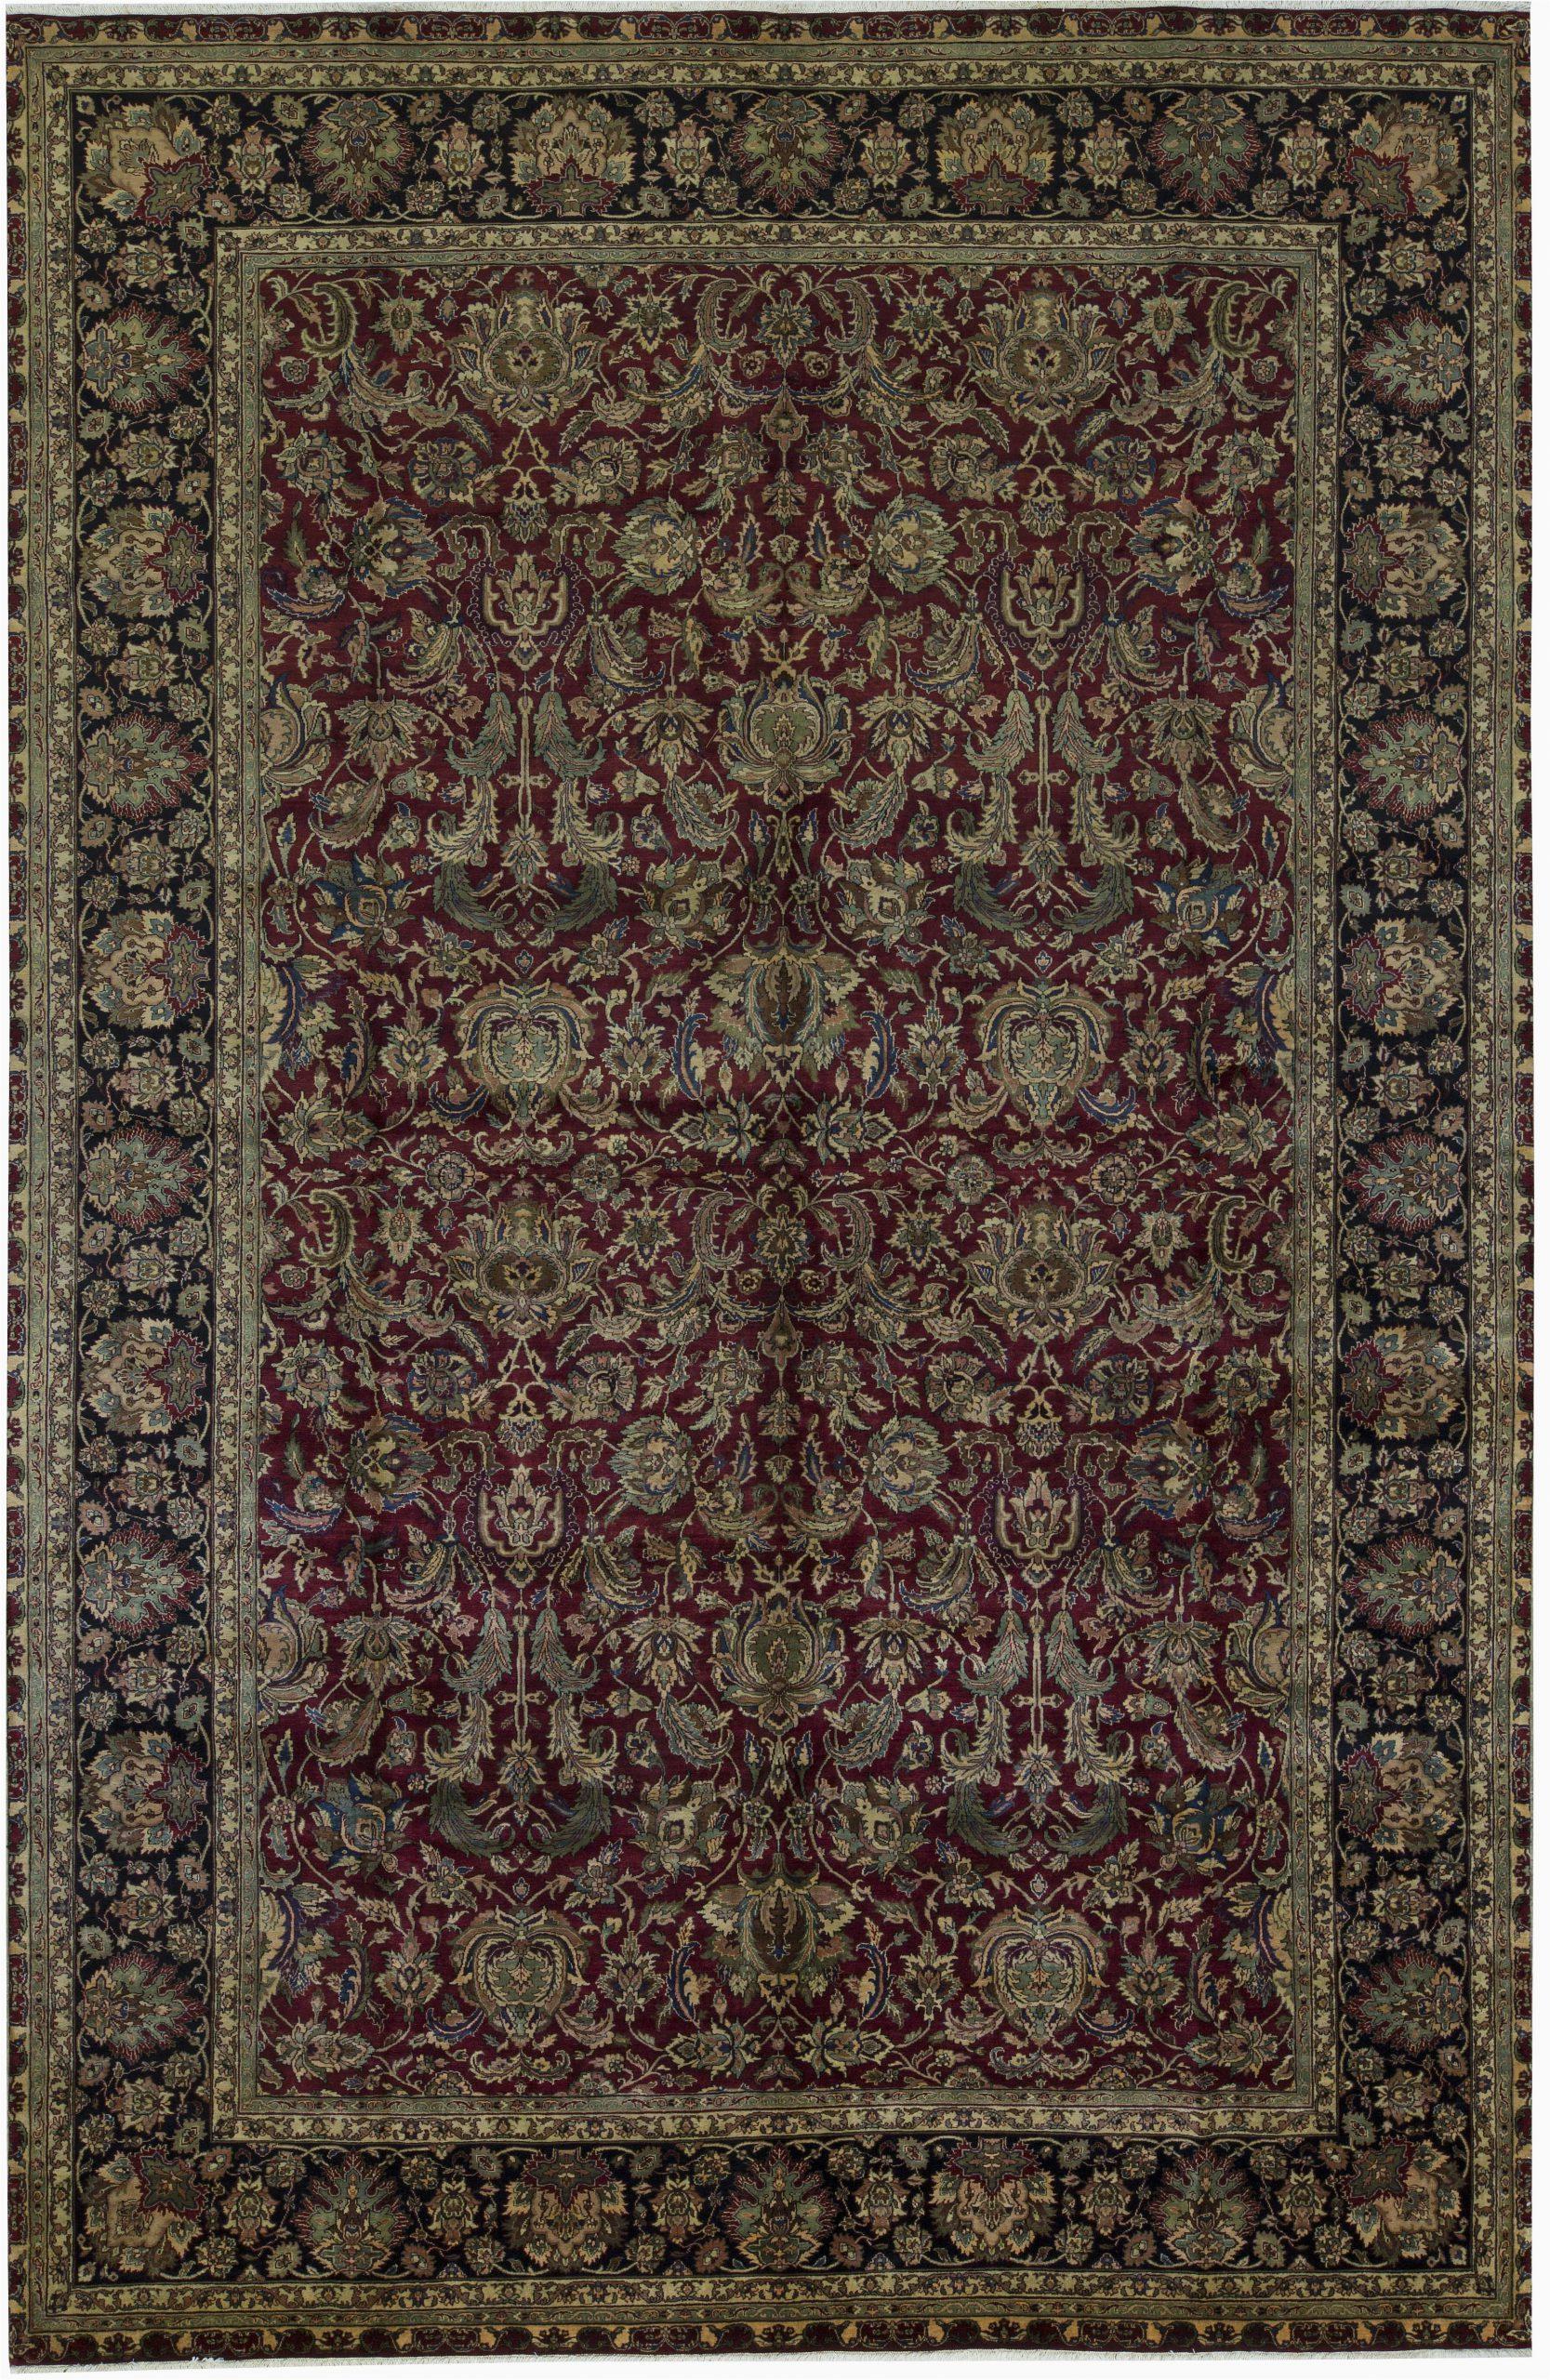 bokara rug co inc one of a kind hand knotted brownred 119 x 18 area rug abhd4070